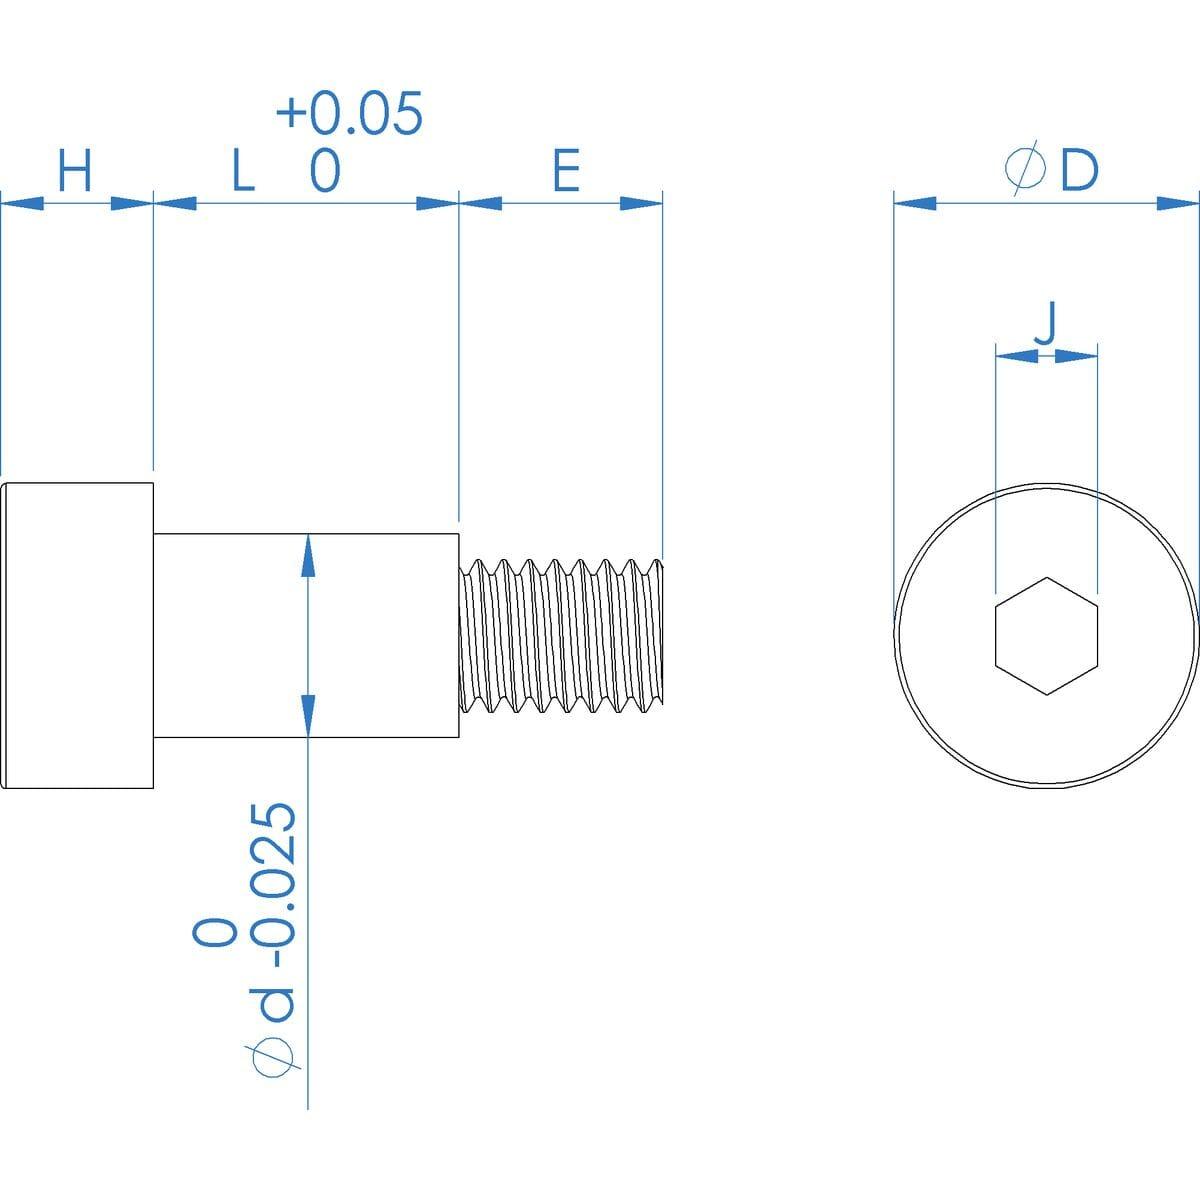 M3 (4mm) x 10mm AMPG Socket Shoulder Screws - A2 Stainless Steel Drawing